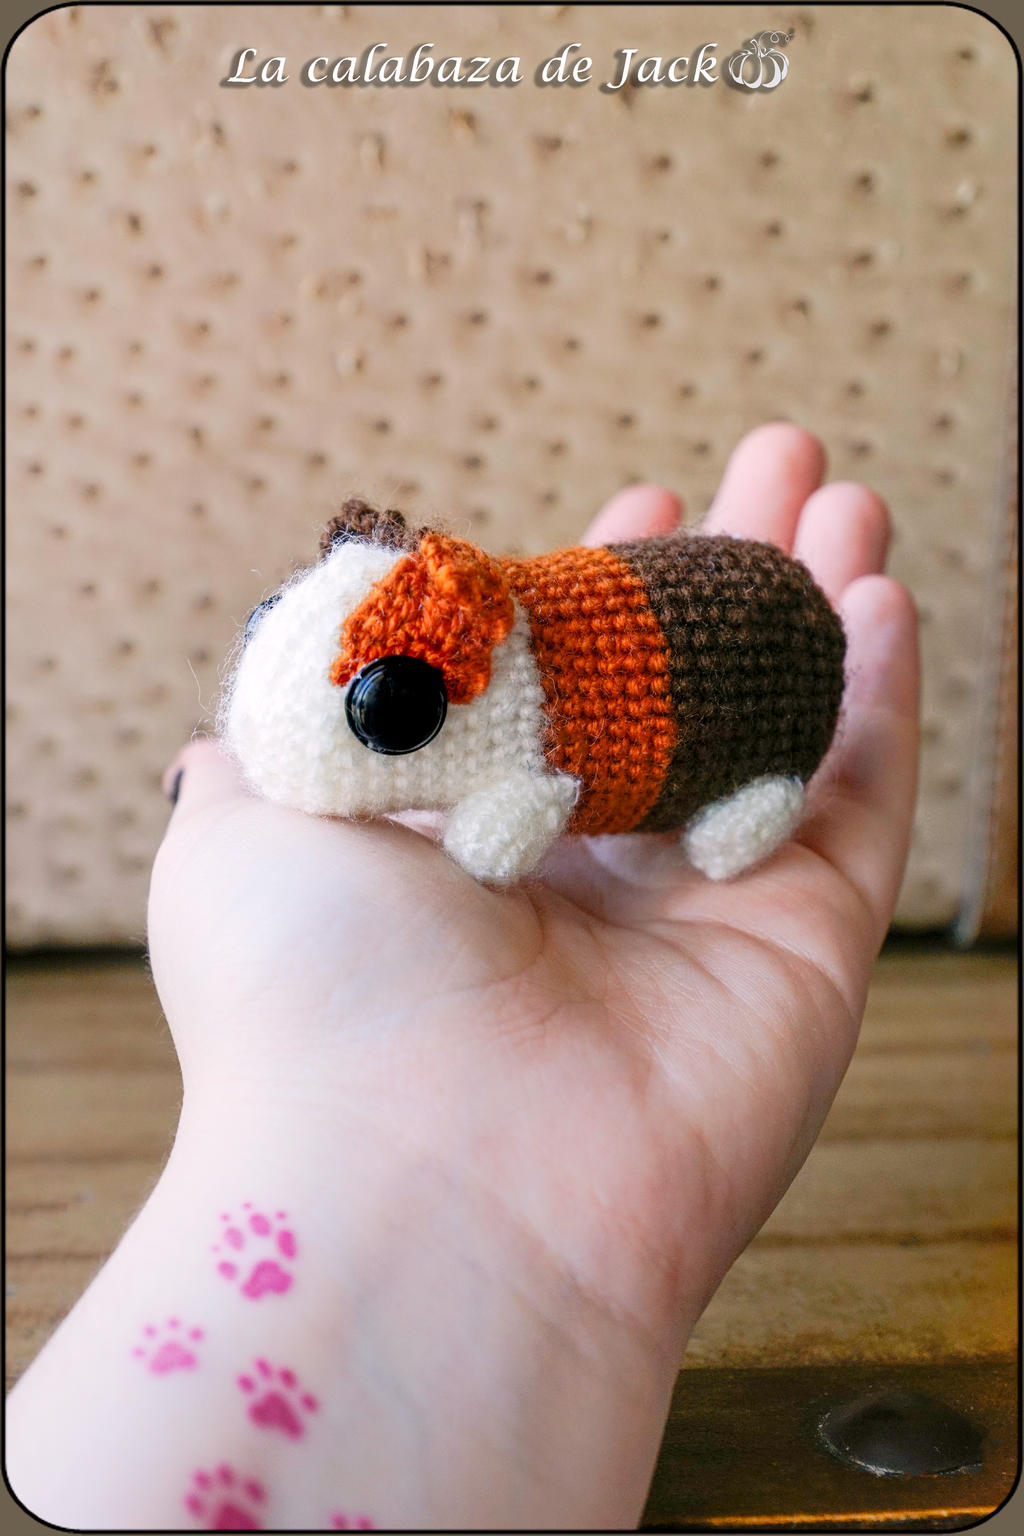 How To Crochet a Cute Amigurumi Guinea Pig - DIY Crafts Tutorial ... | 1536x1024